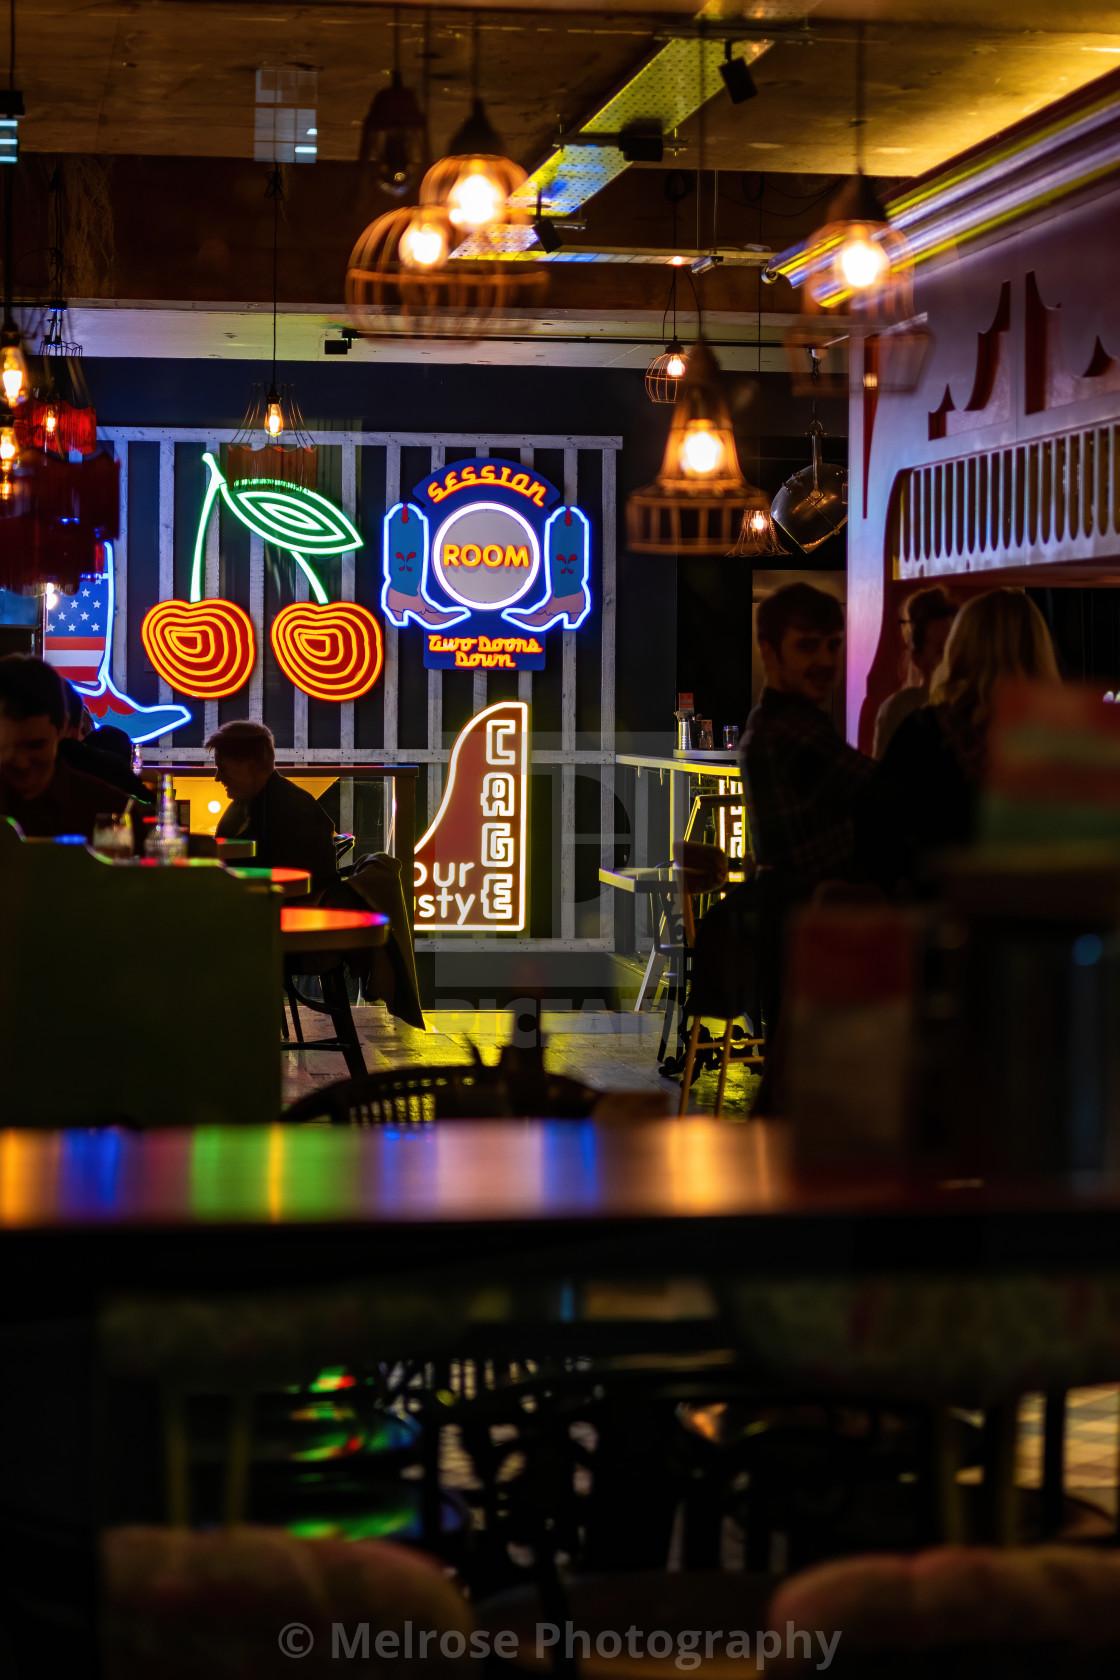 Colours of the pub